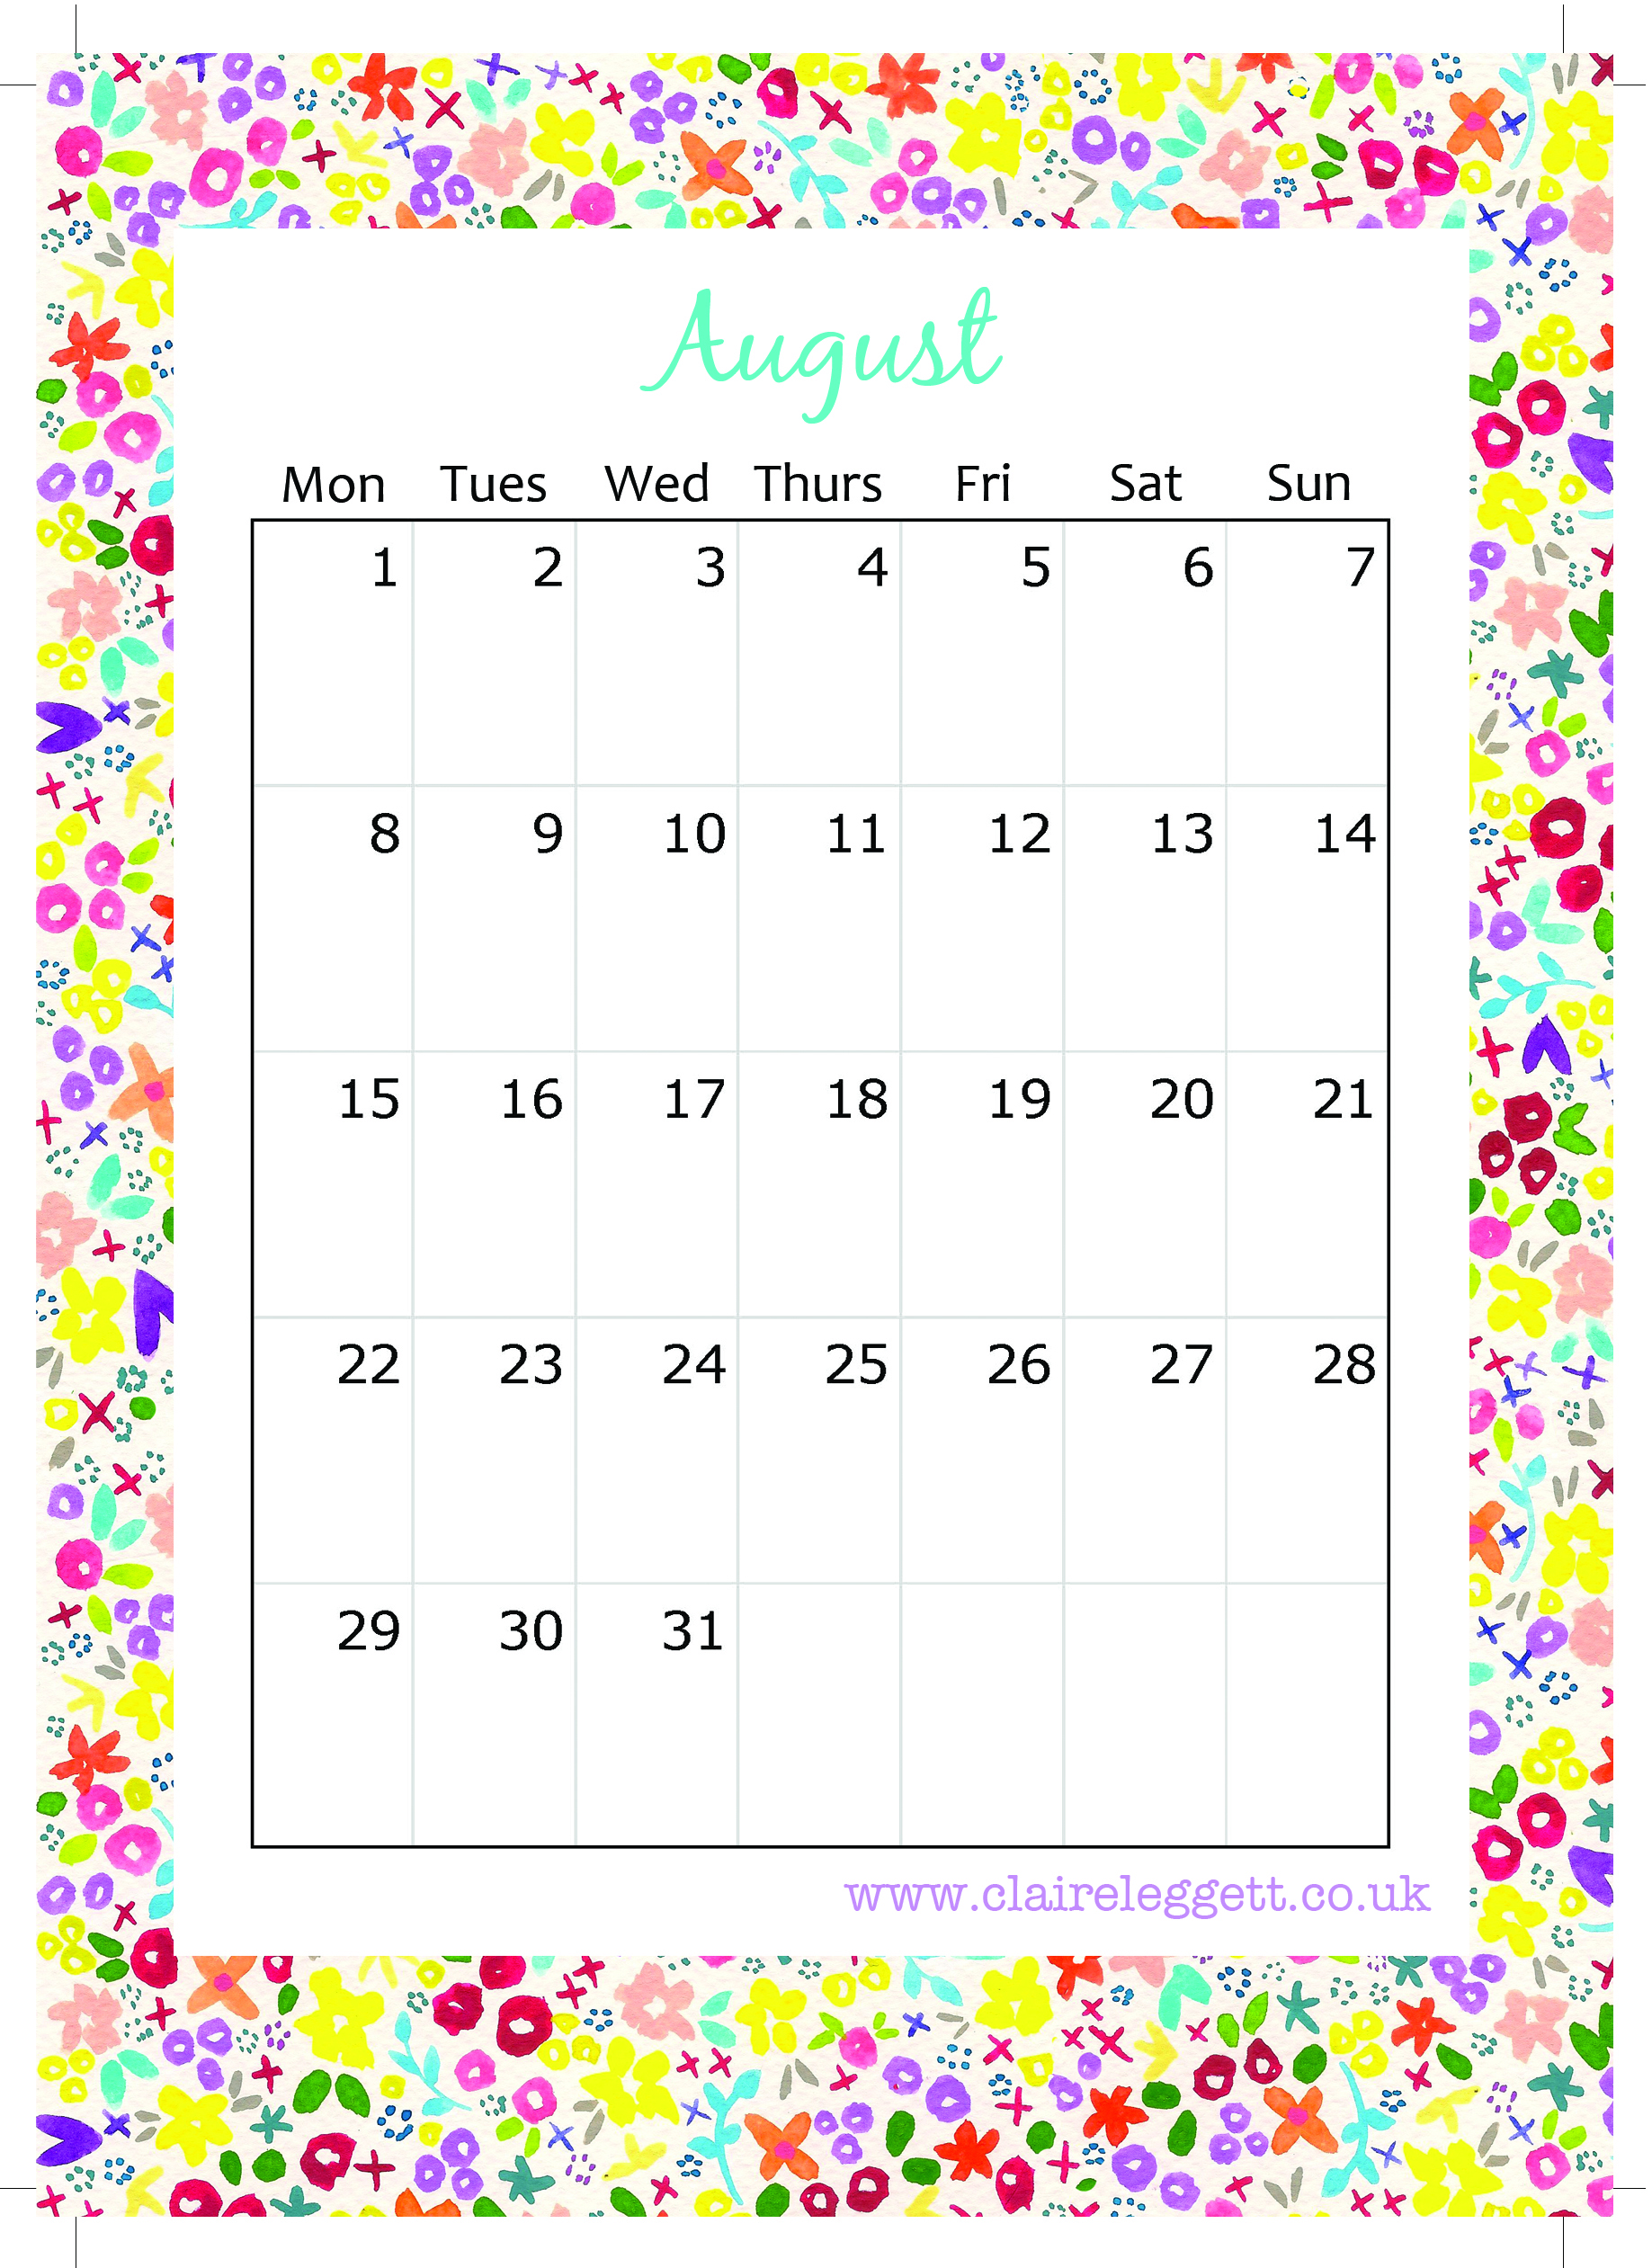 Claire_Leggett__Aug_calendar_2016_pattern_date_page copy